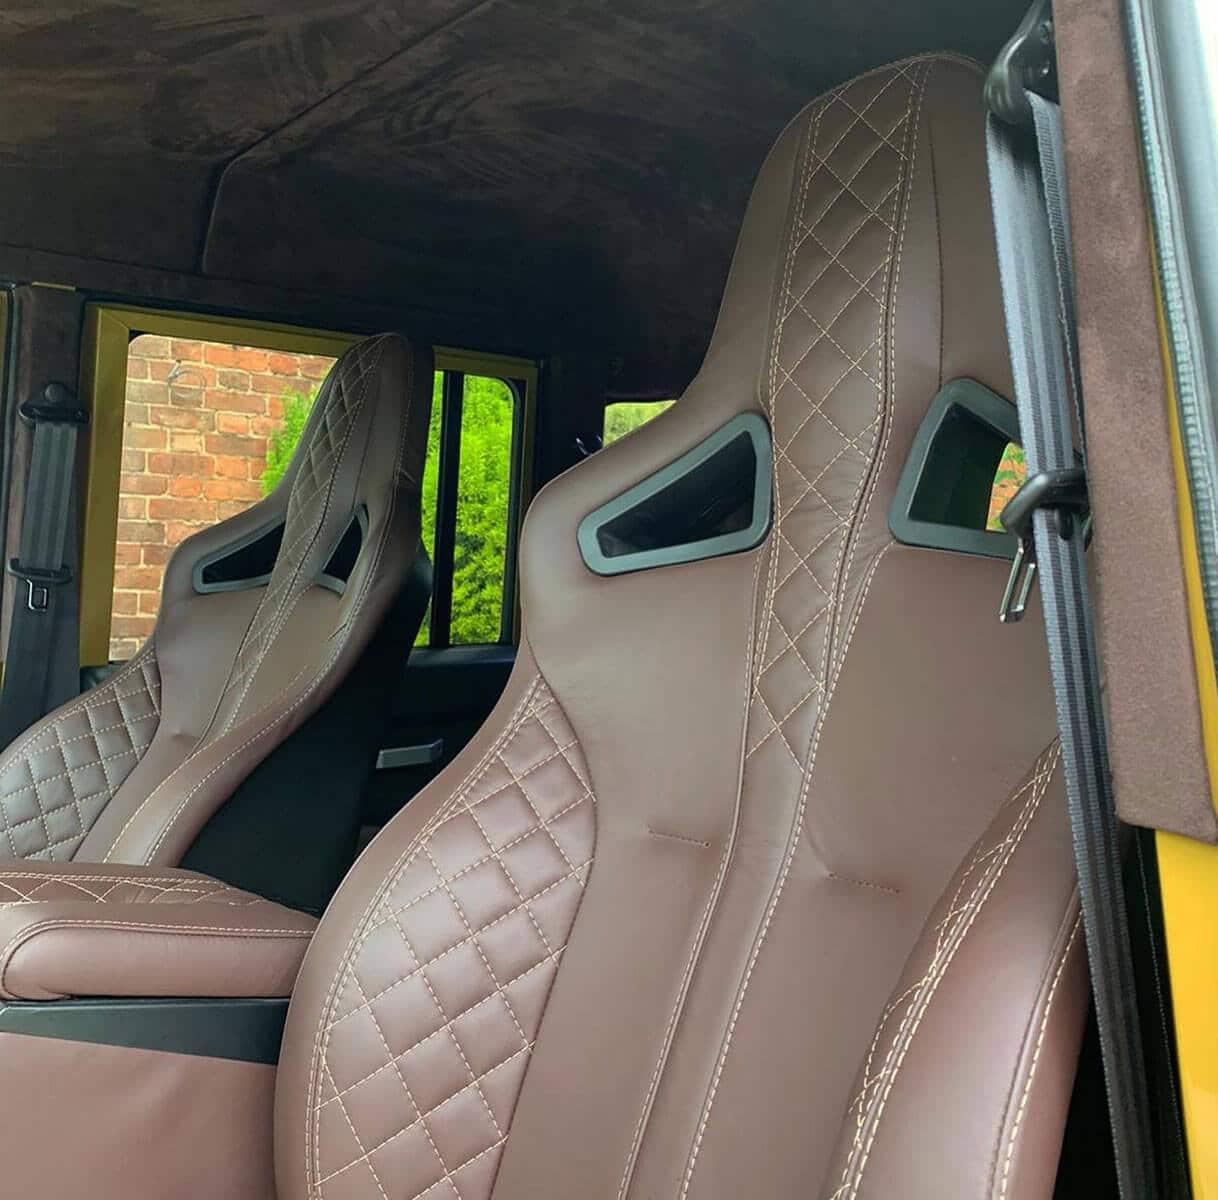 Bayeux The Spectre D110 Double Cab Interior